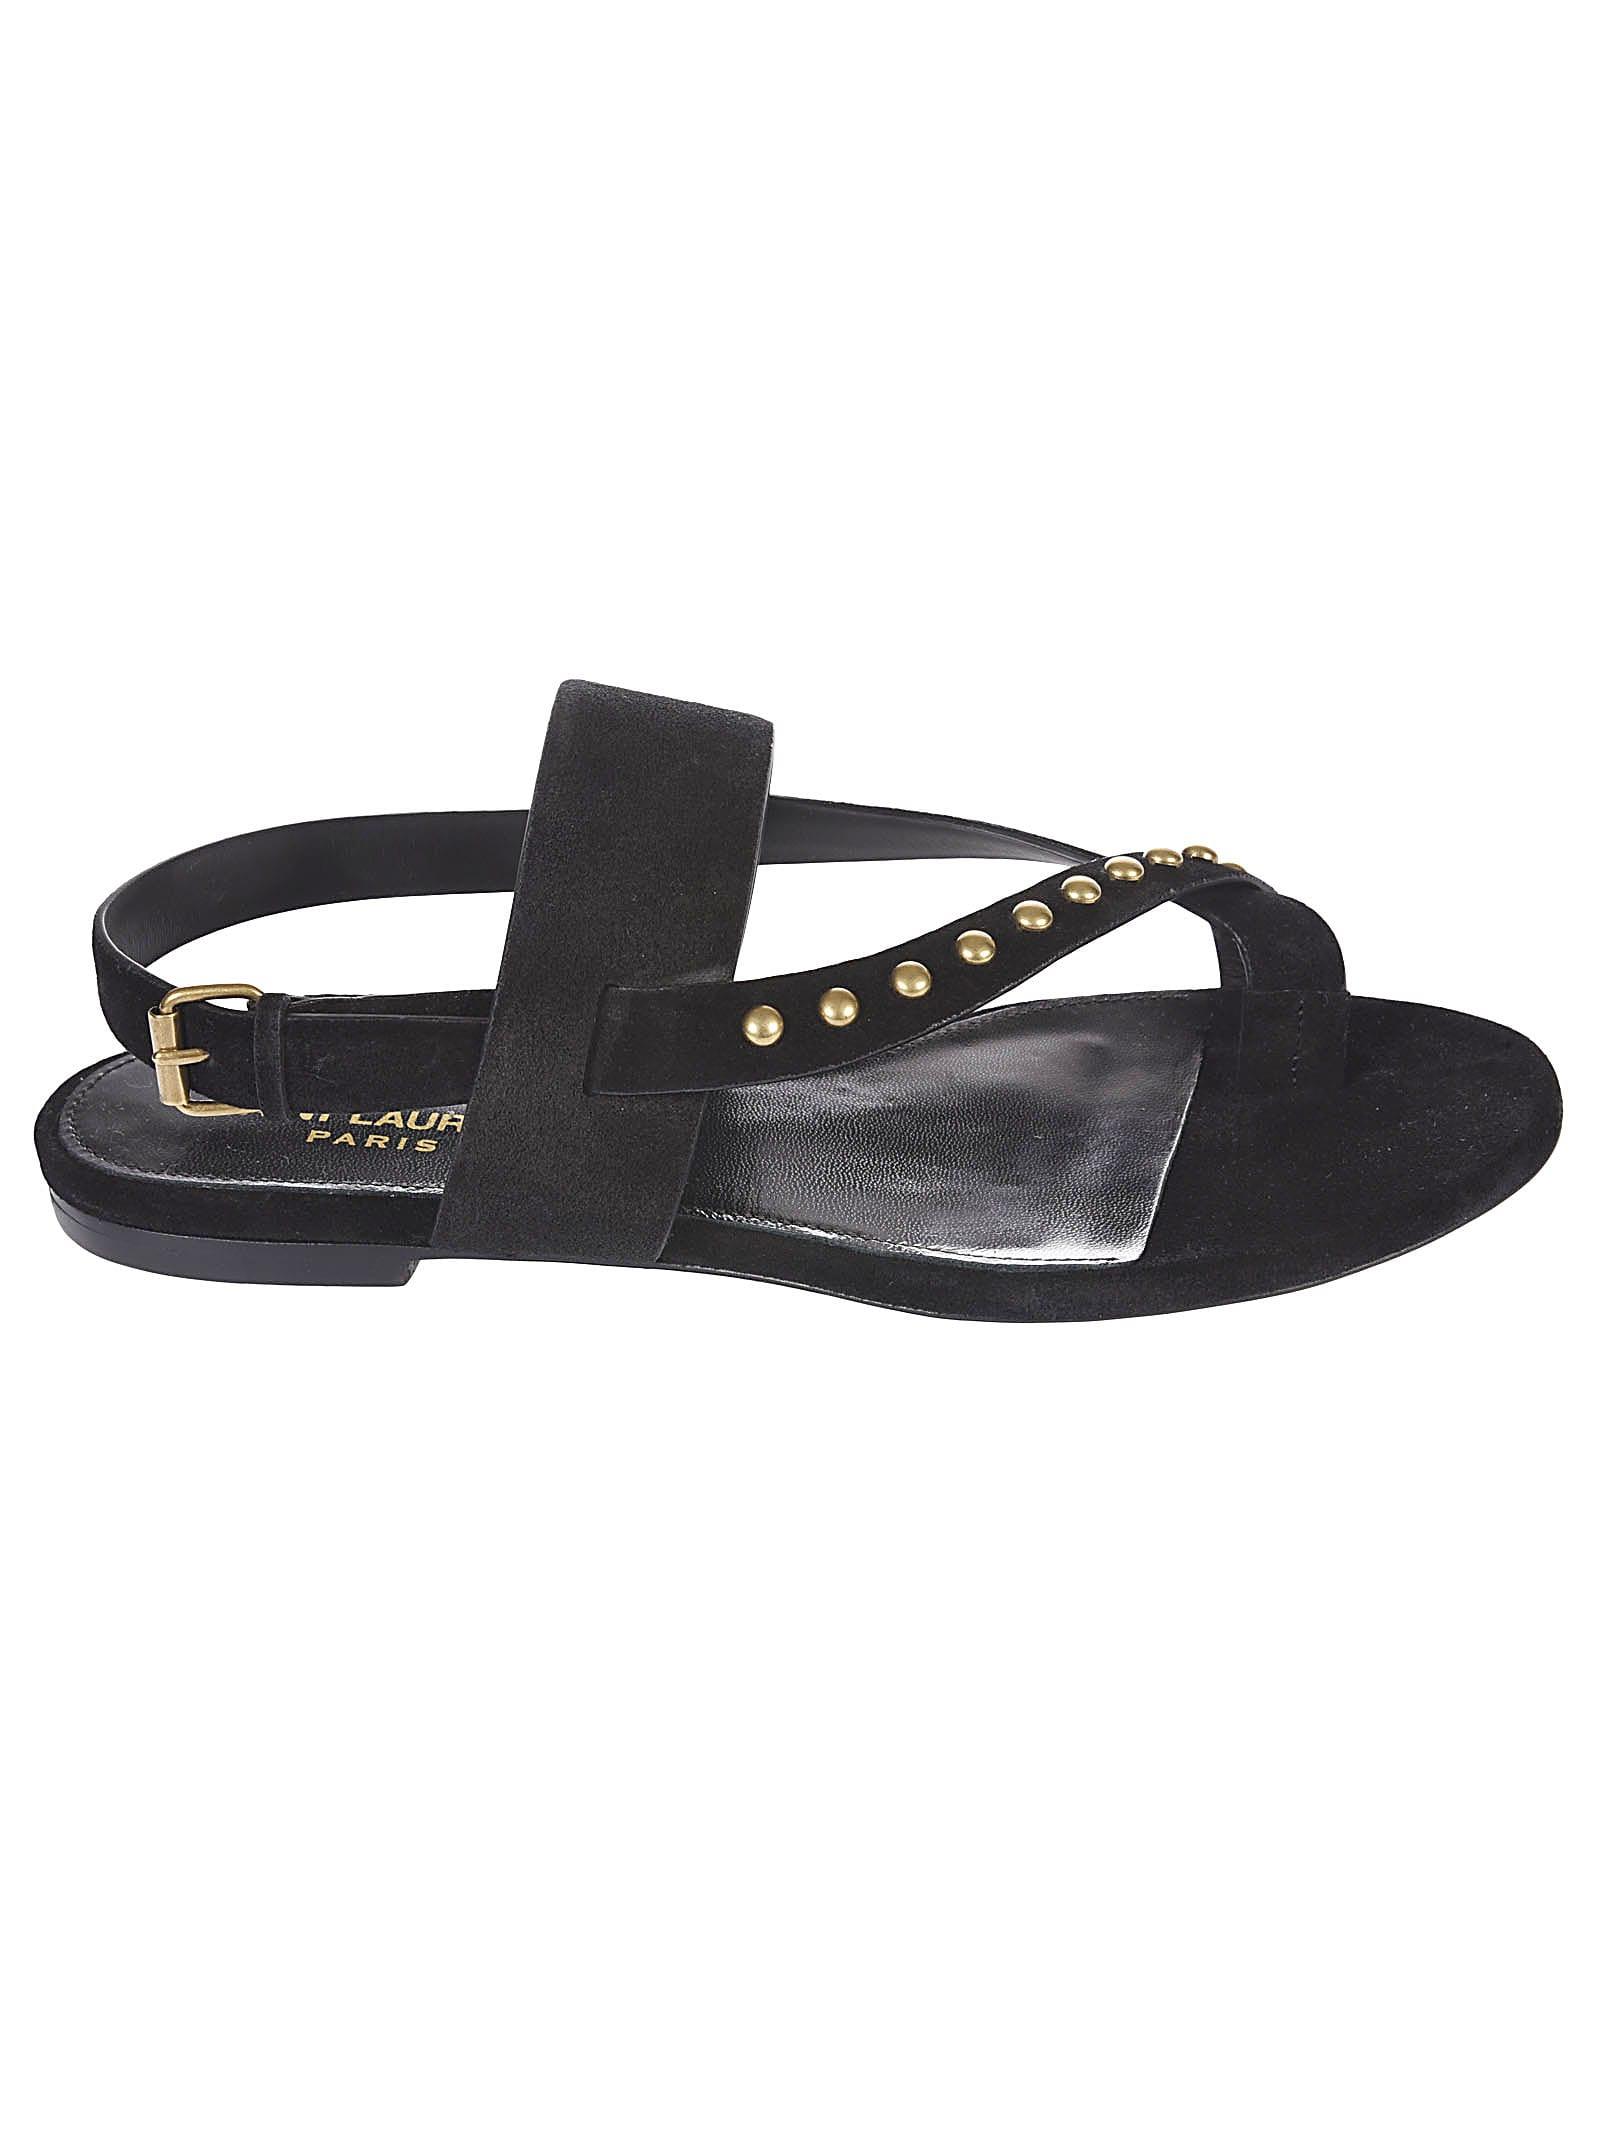 Saint Laurent Gia Studs Flat Sandals In Black